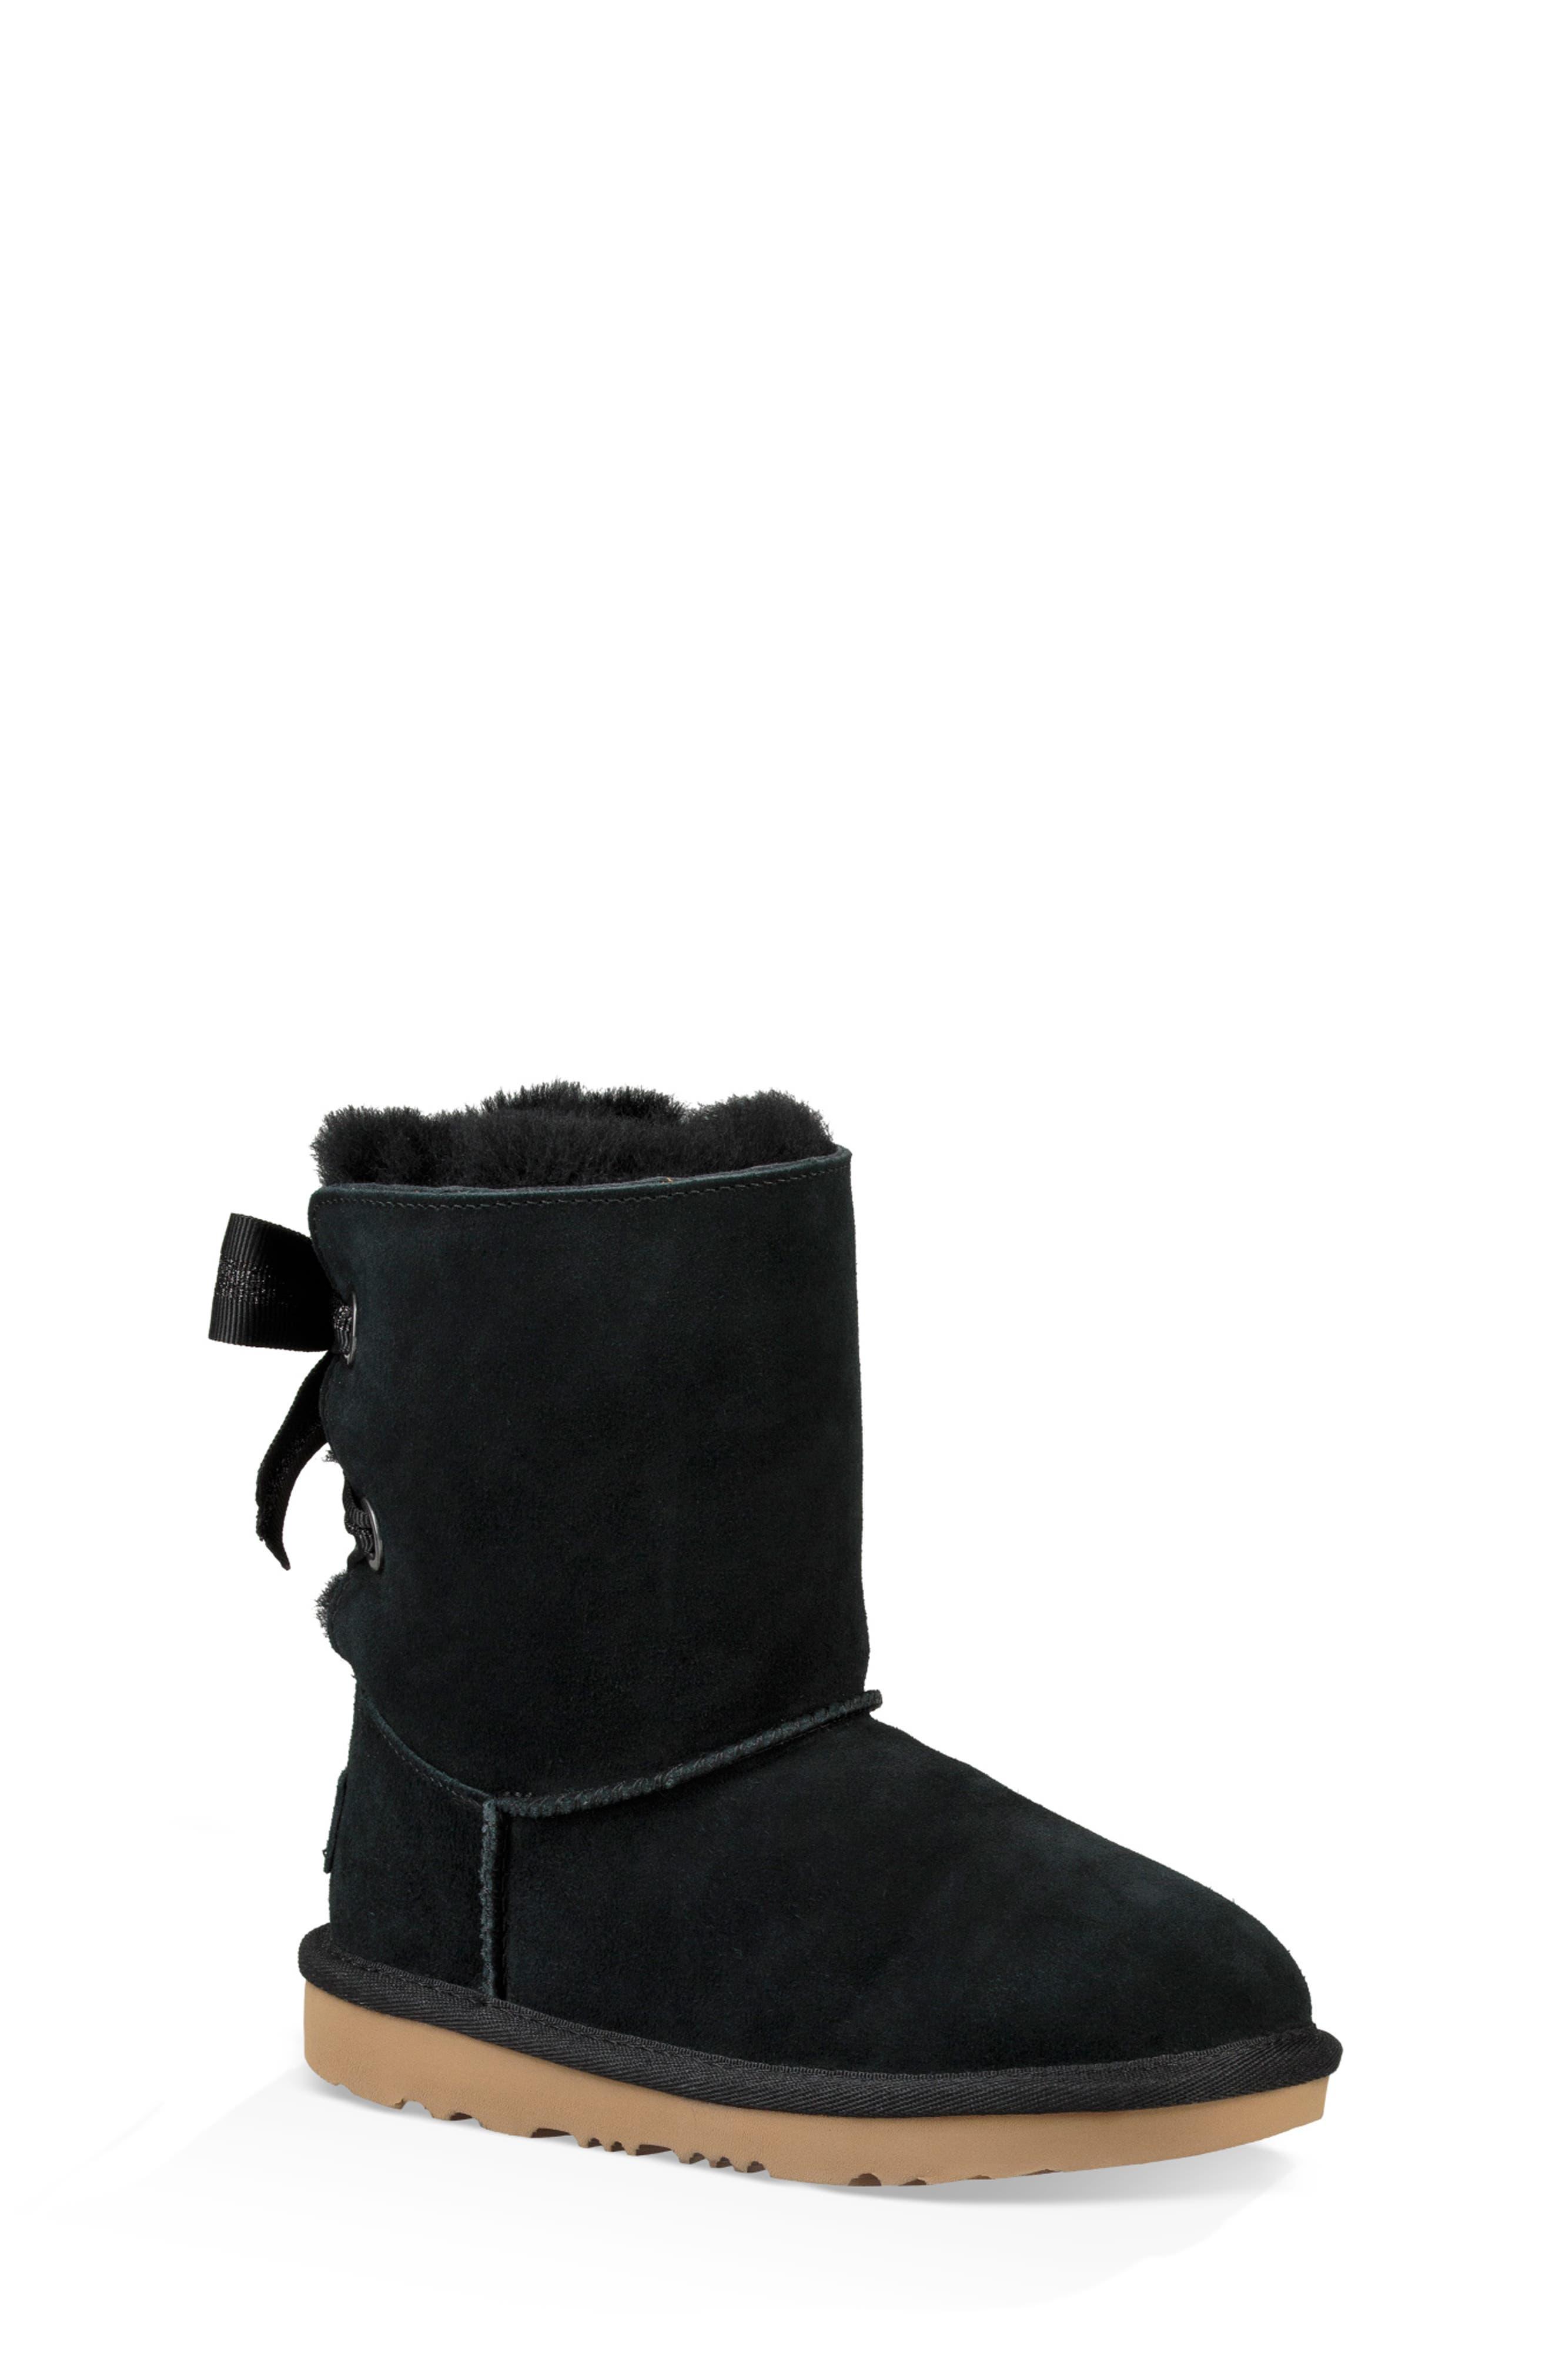 UGG<SUP>®</SUP> Customizable Bailey Bow II Genuine Shearling Boot, Main, color, BLACK